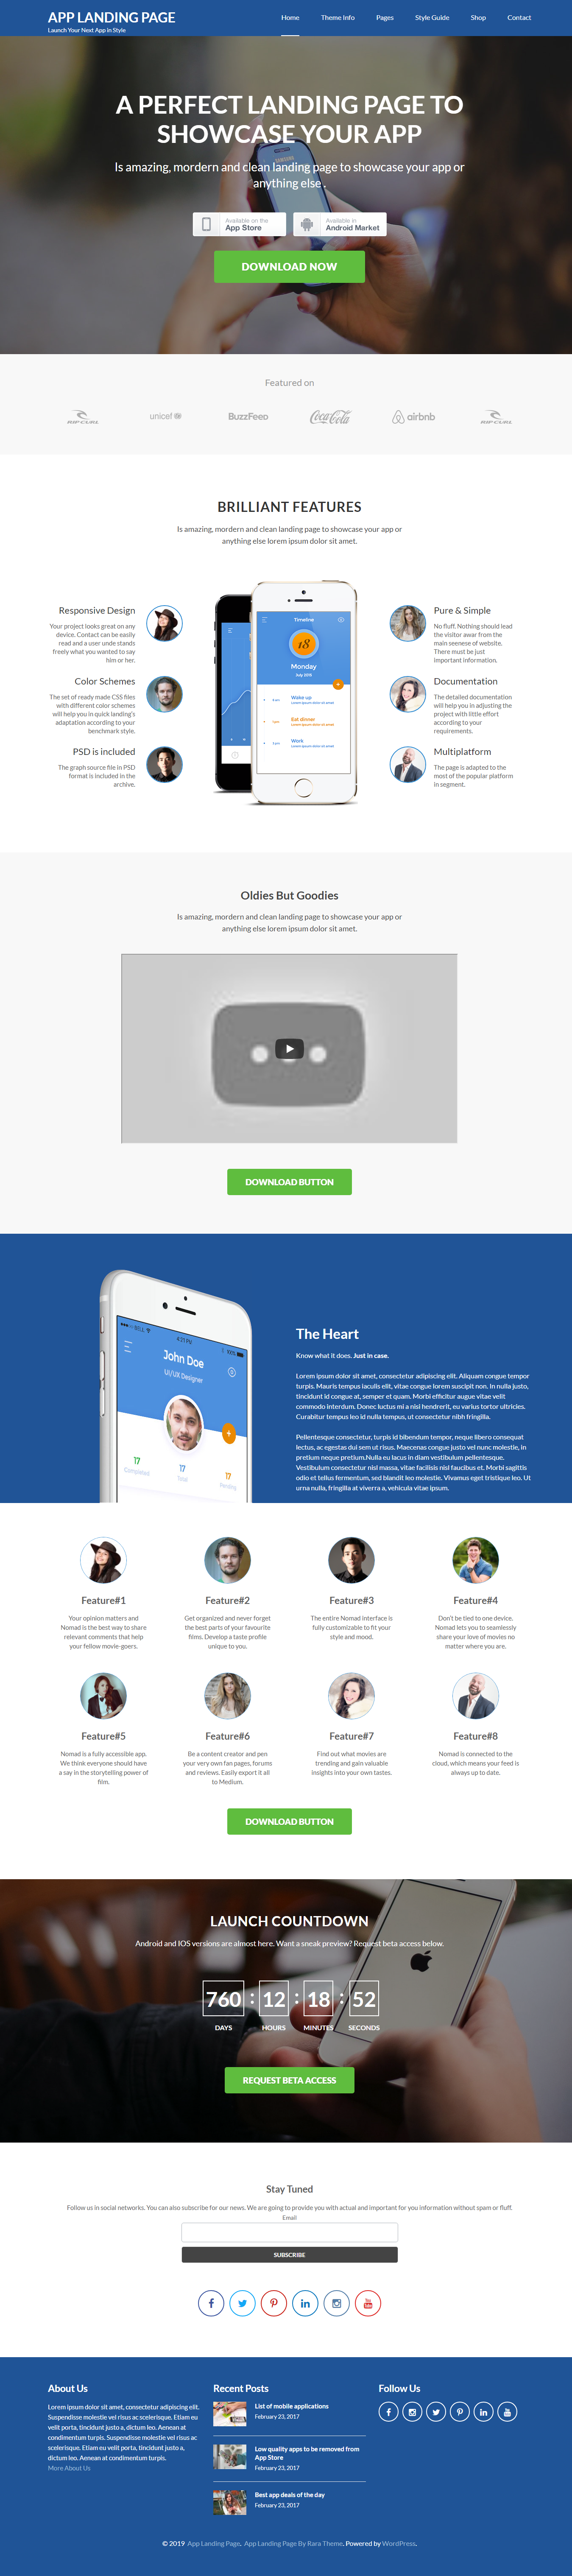 App Landing Page - Best Free Mobile App WordPress Theme